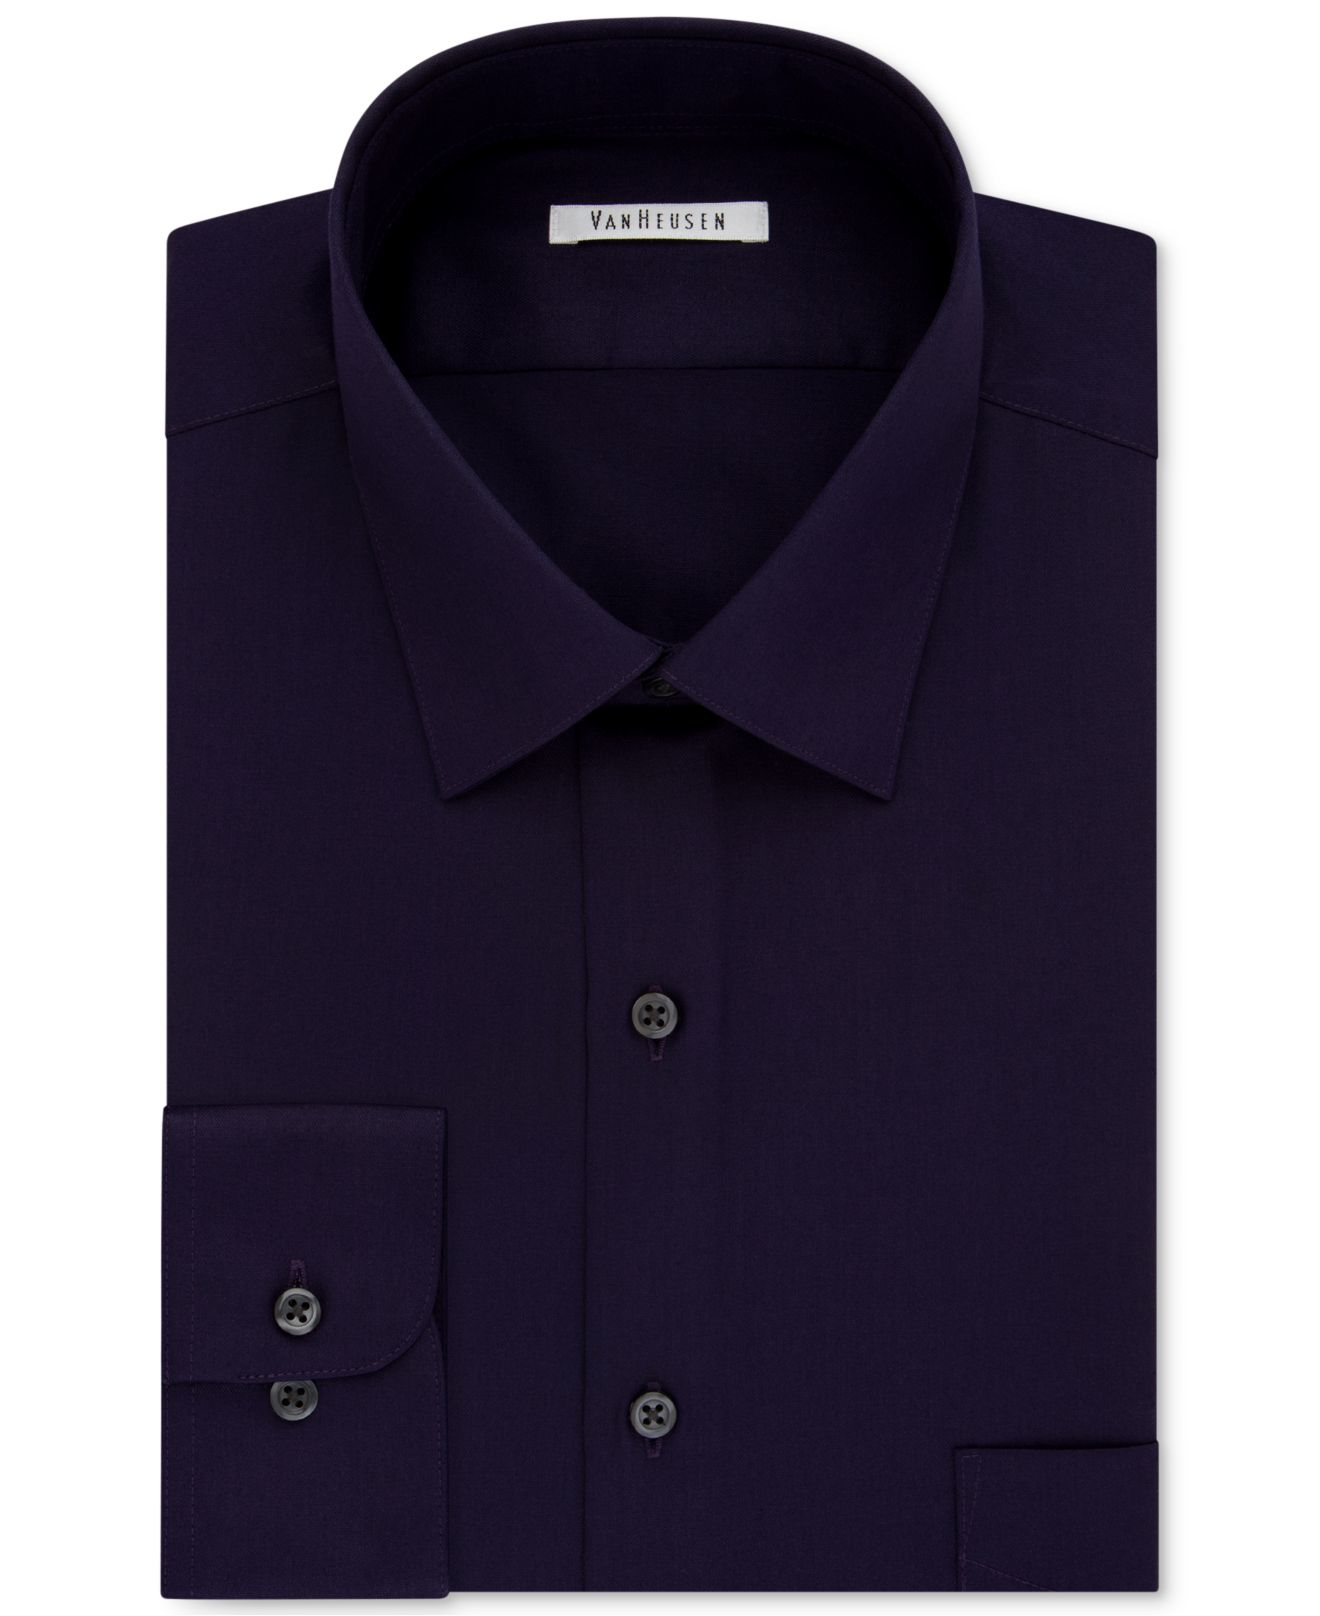 Lyst van heusen men 39 s big and tall solid dress shirt in for Big and tall purple dress shirts